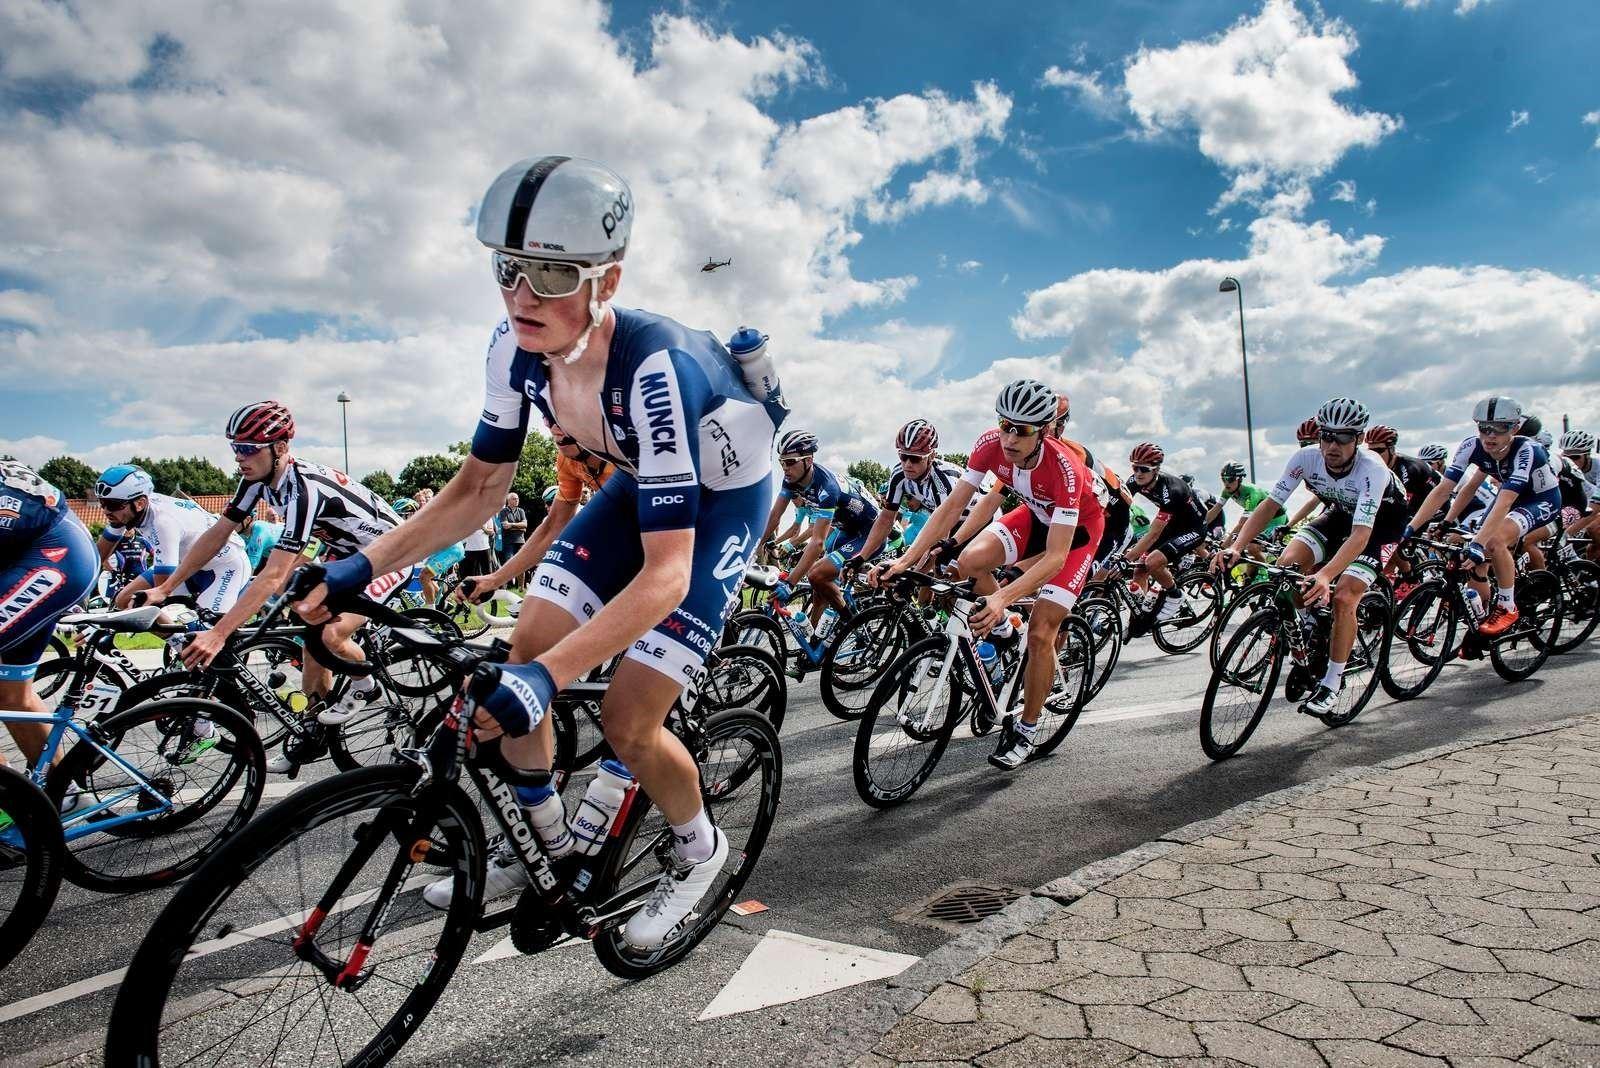 Danmarksmesterskab - Cykelløb for unge